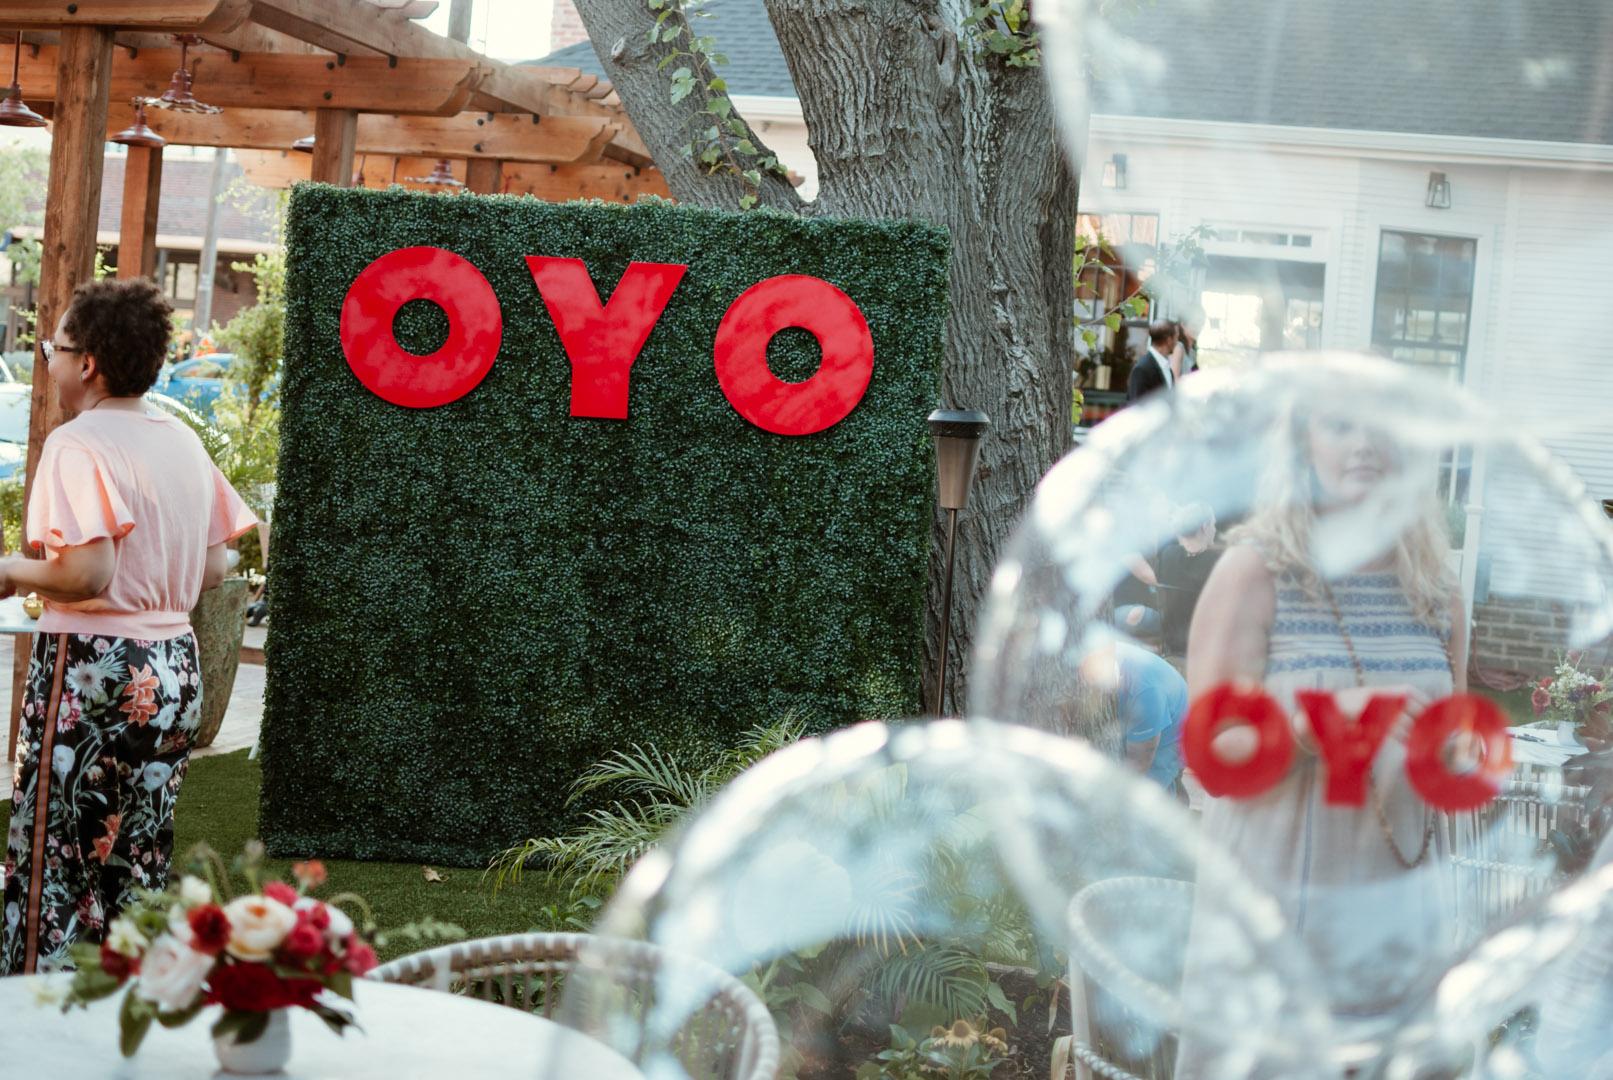 OYO-89.jpg